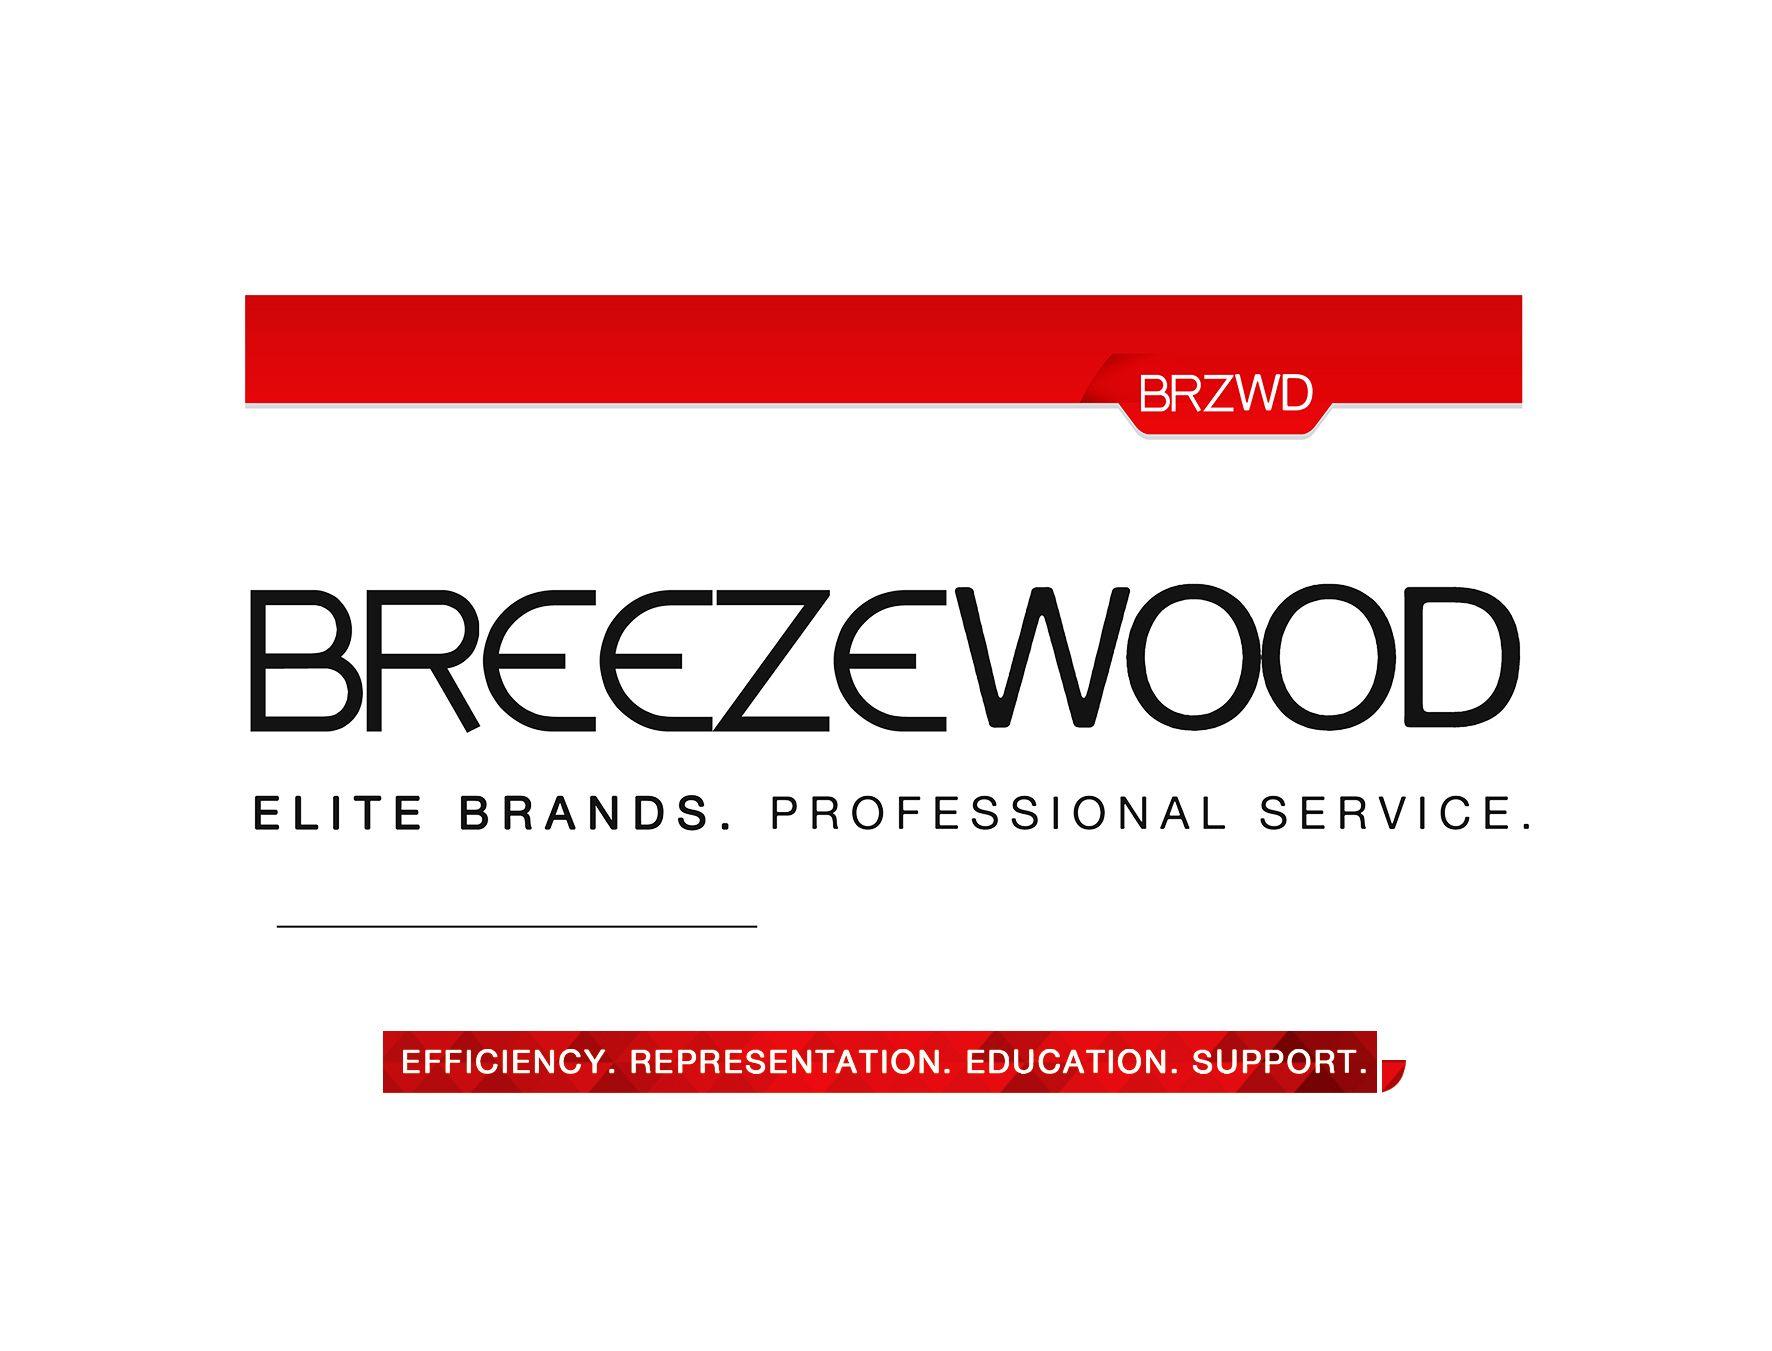 Brzwd breezewood_ elite brand distributor of professional